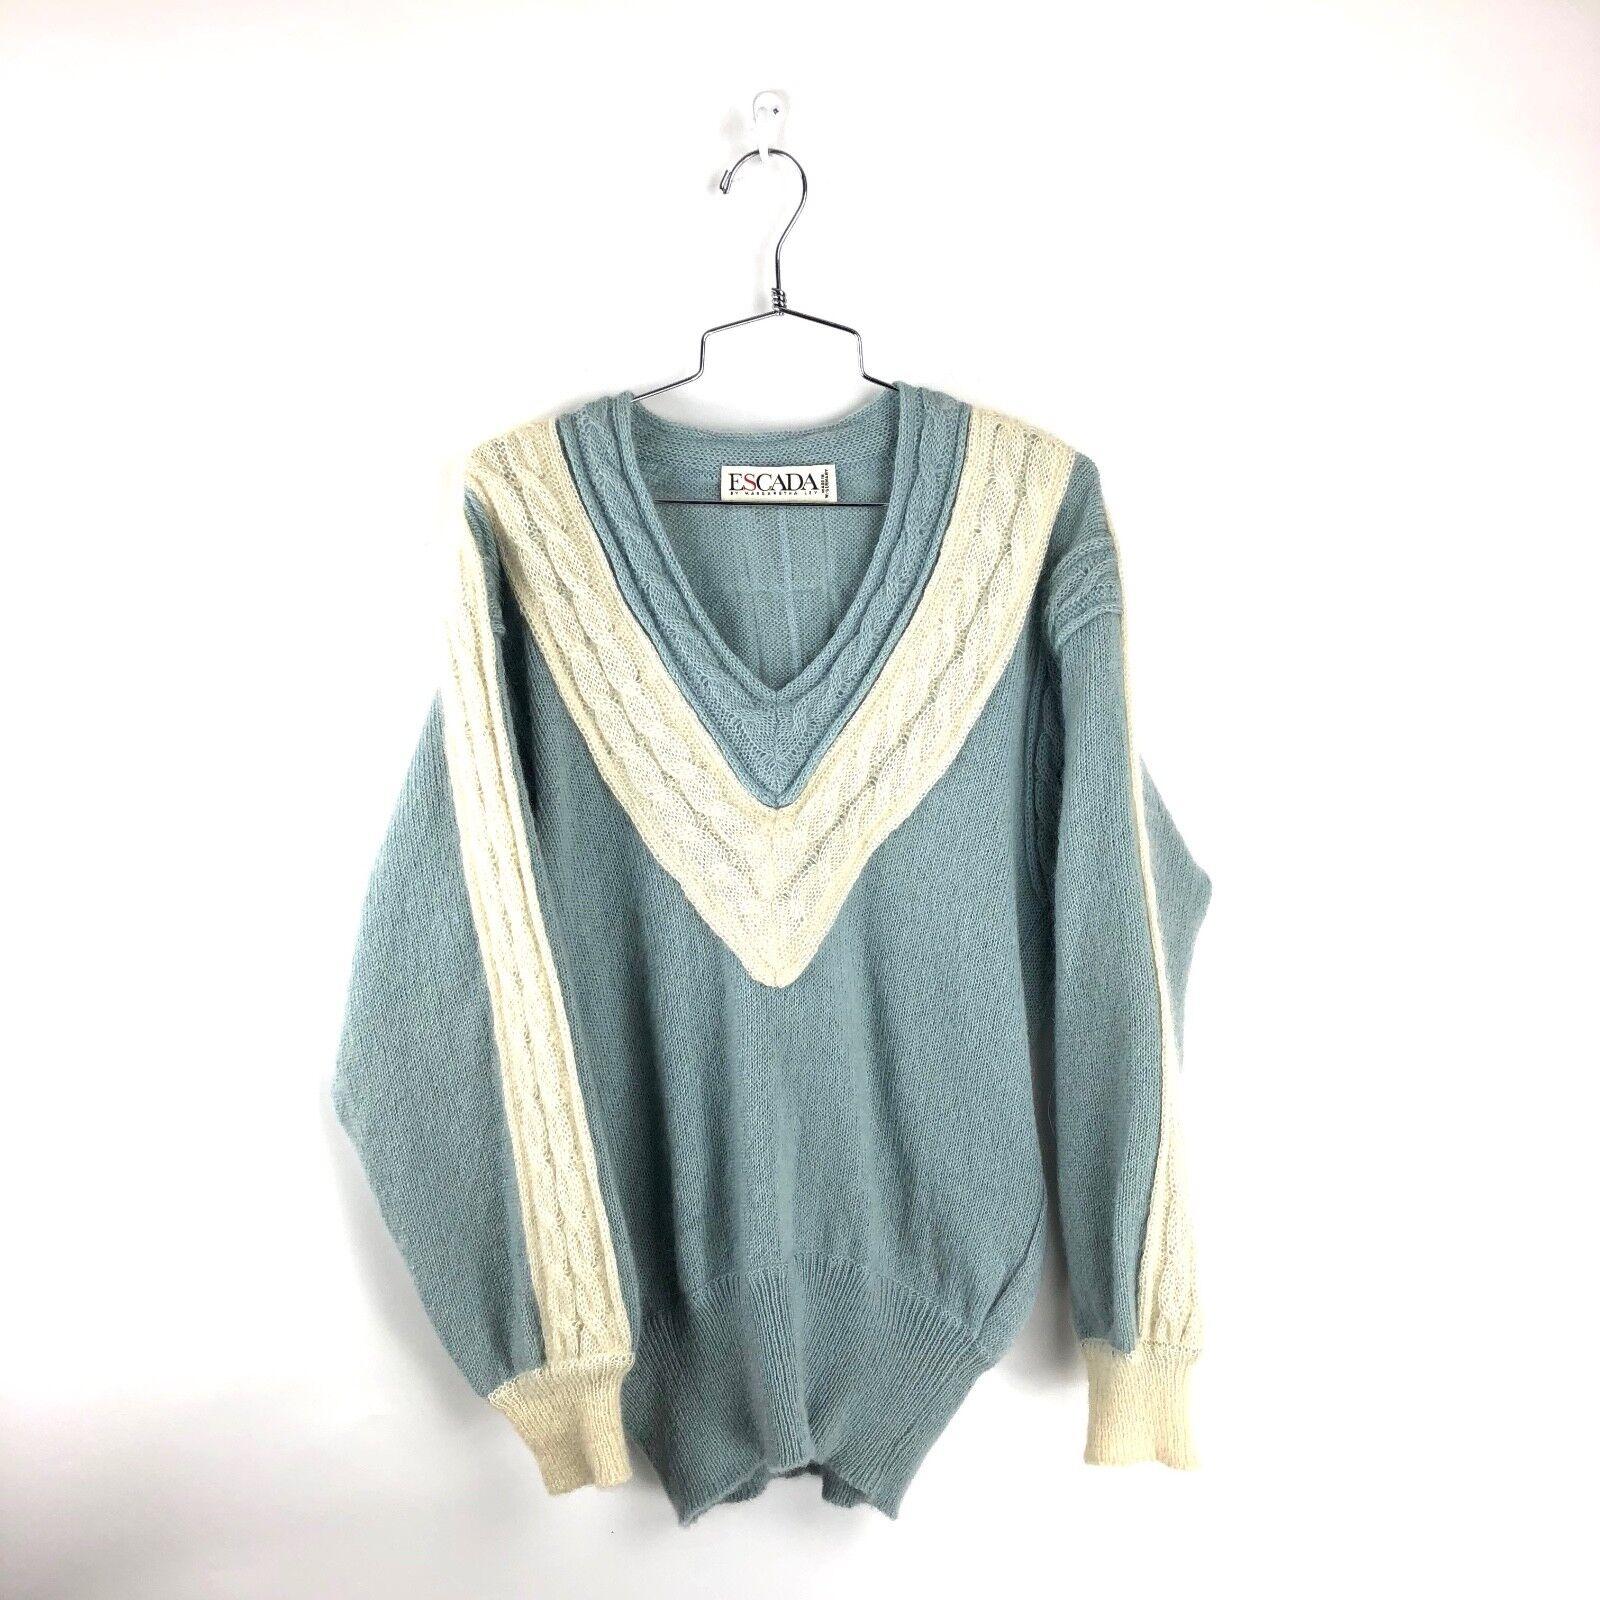 VTG Escada Sweater Size 34 Small Sweatshirt Acrylic Knit bluee Womens